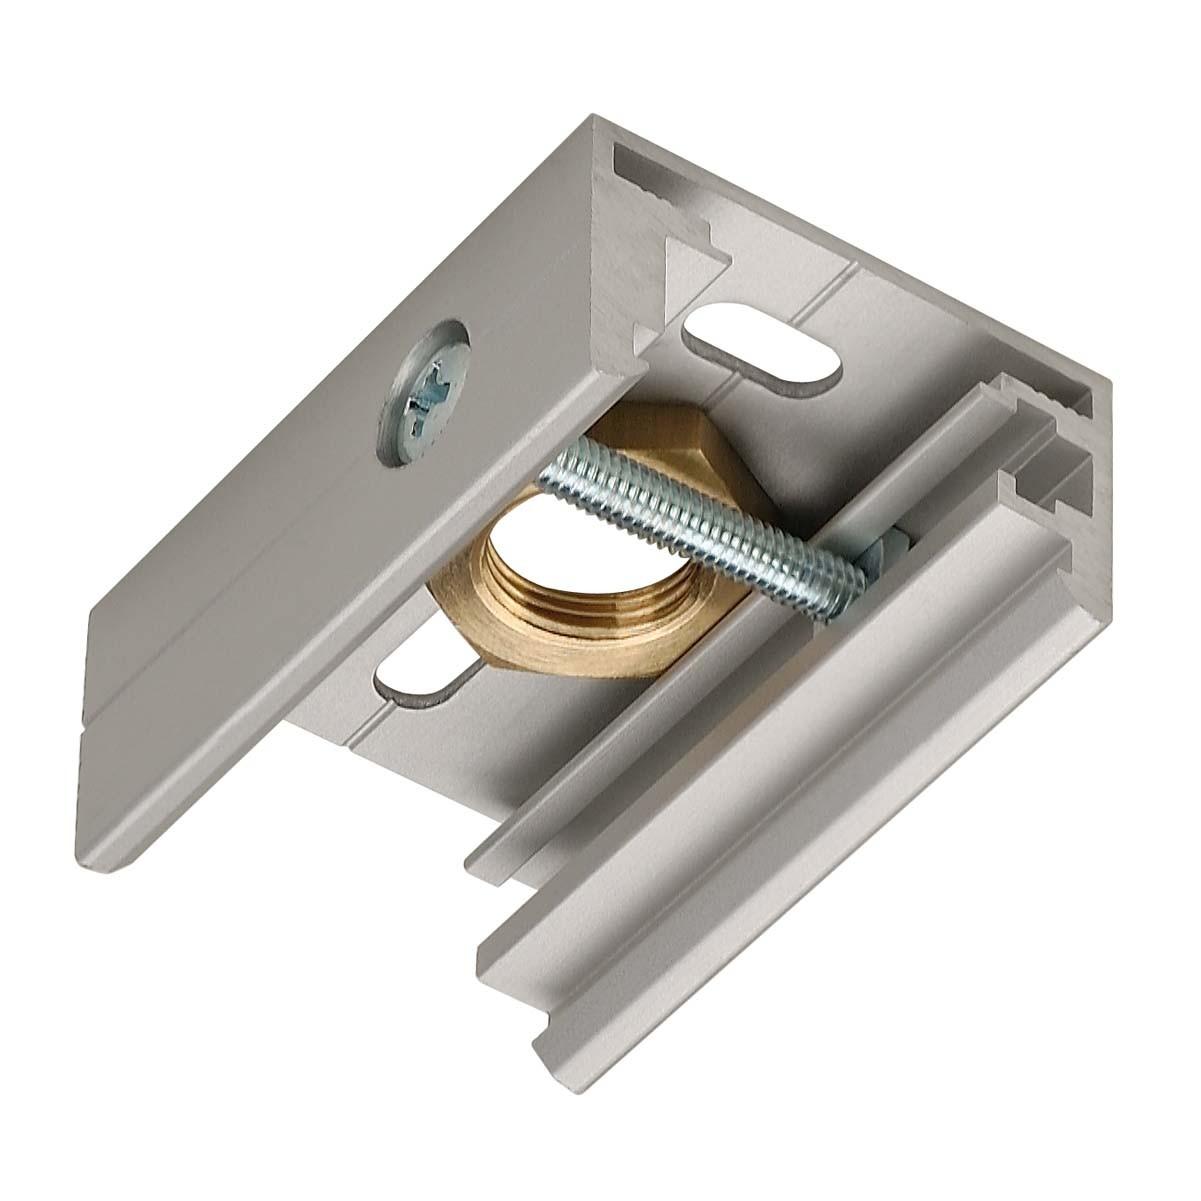 SLV 145734 Pendant Clip Silver Grey Eutrac 3 Circuit 240V Surface Track Accessory